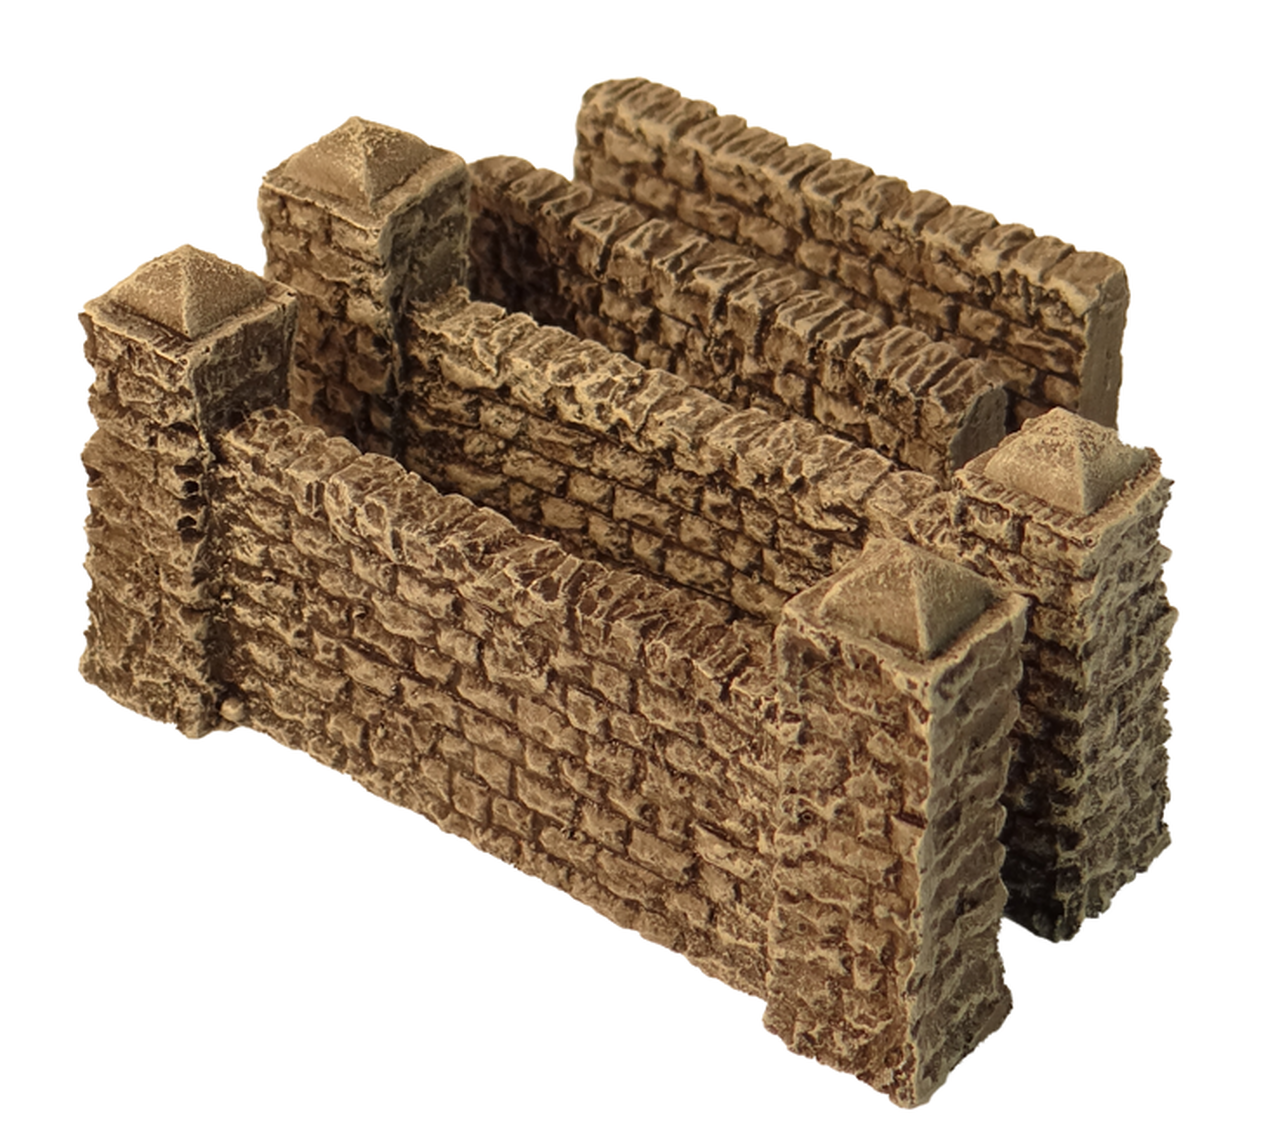 1061-Small Stone Walls 6pc